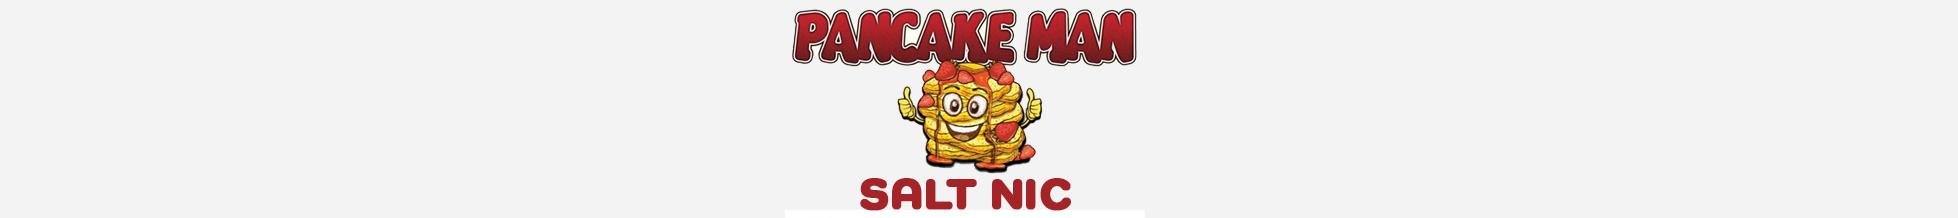 pancakeman-salt-nic.jpg